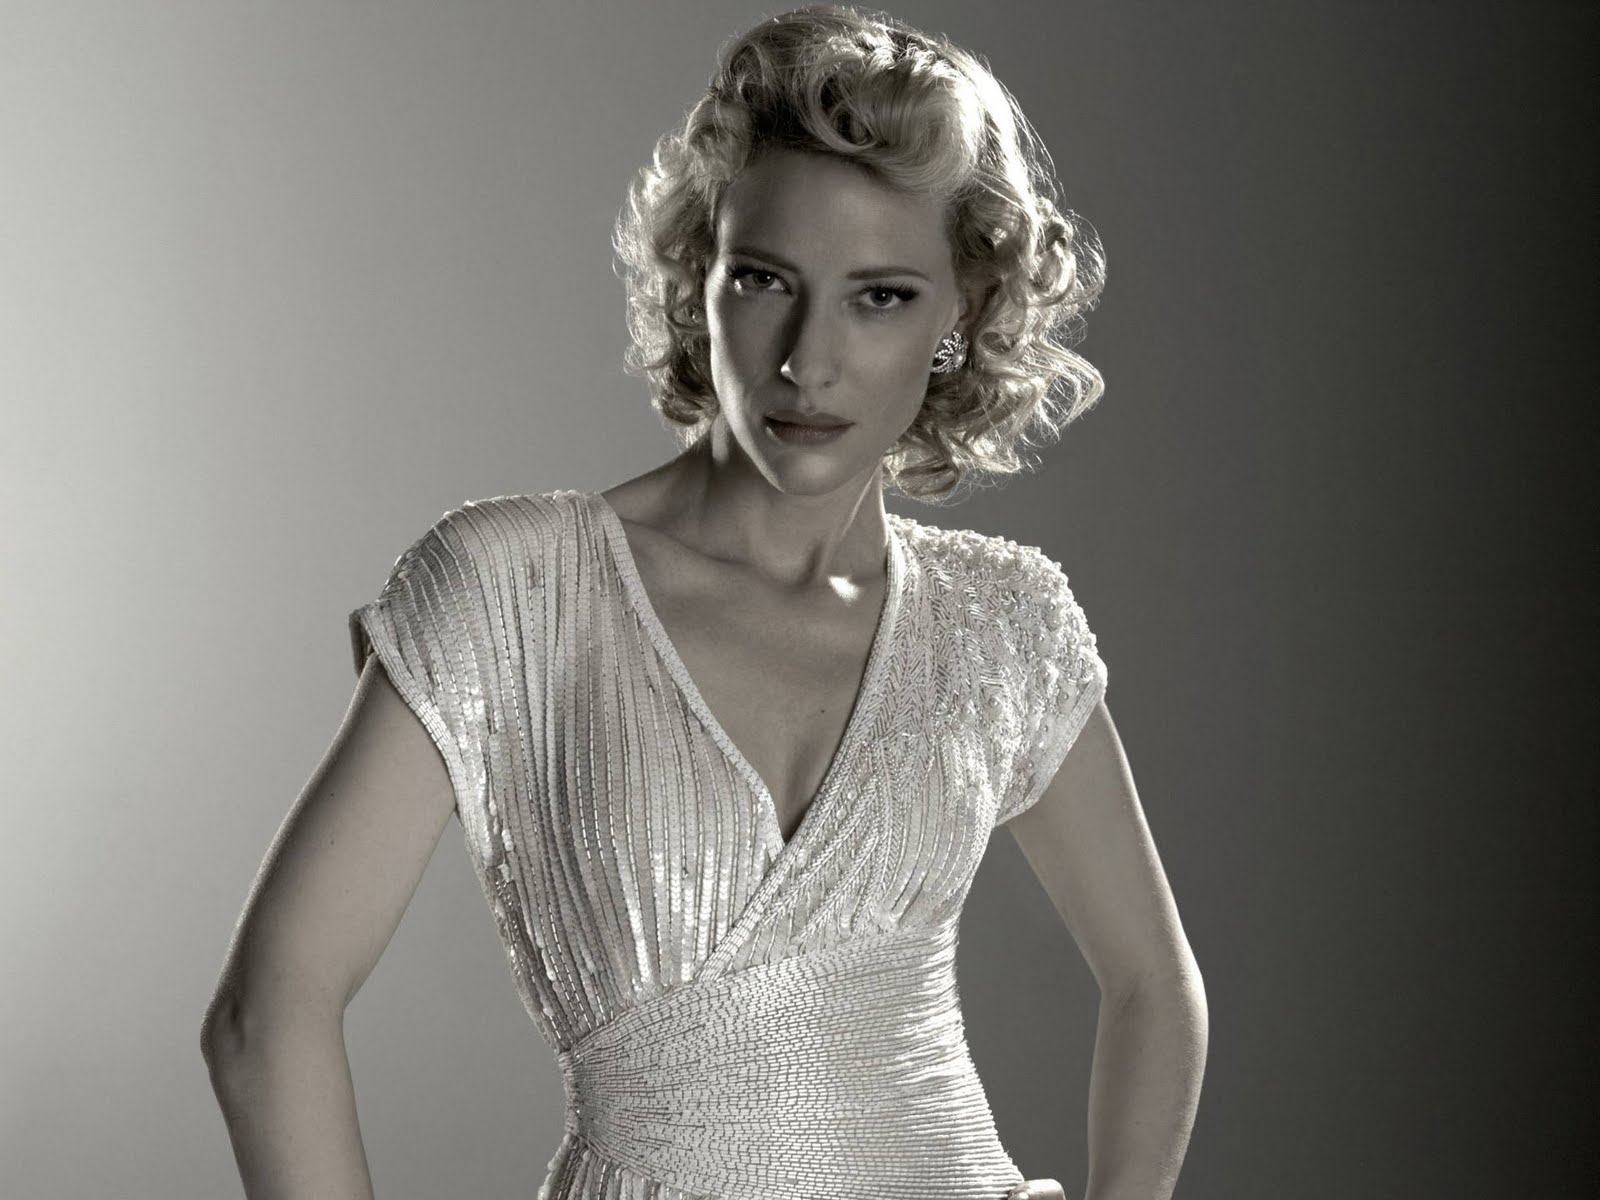 http://2.bp.blogspot.com/-hMX26nXITAs/TmWu5czqBdI/AAAAAAAABuw/kwT1pj8ZyWg/s1600/Hot+Cate+Blanchett+Pictures+%25281%2529.jpg